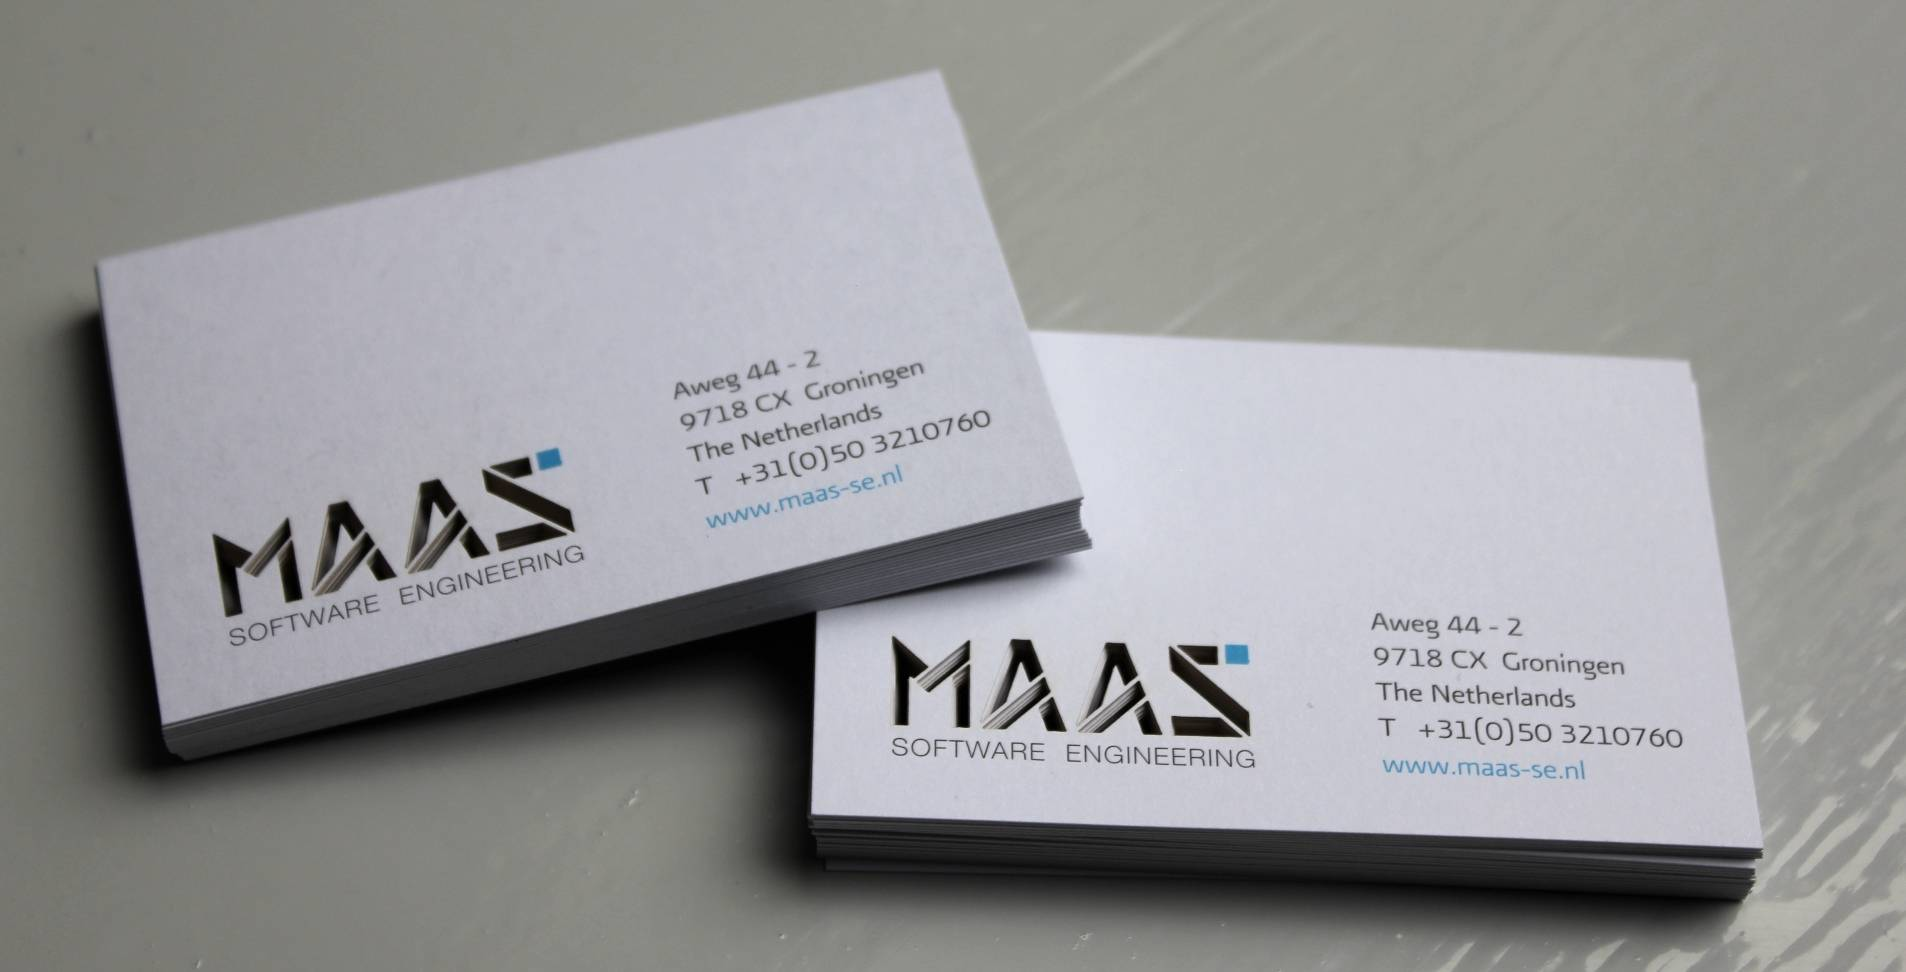 Maas-SE – Maas Software Engineering